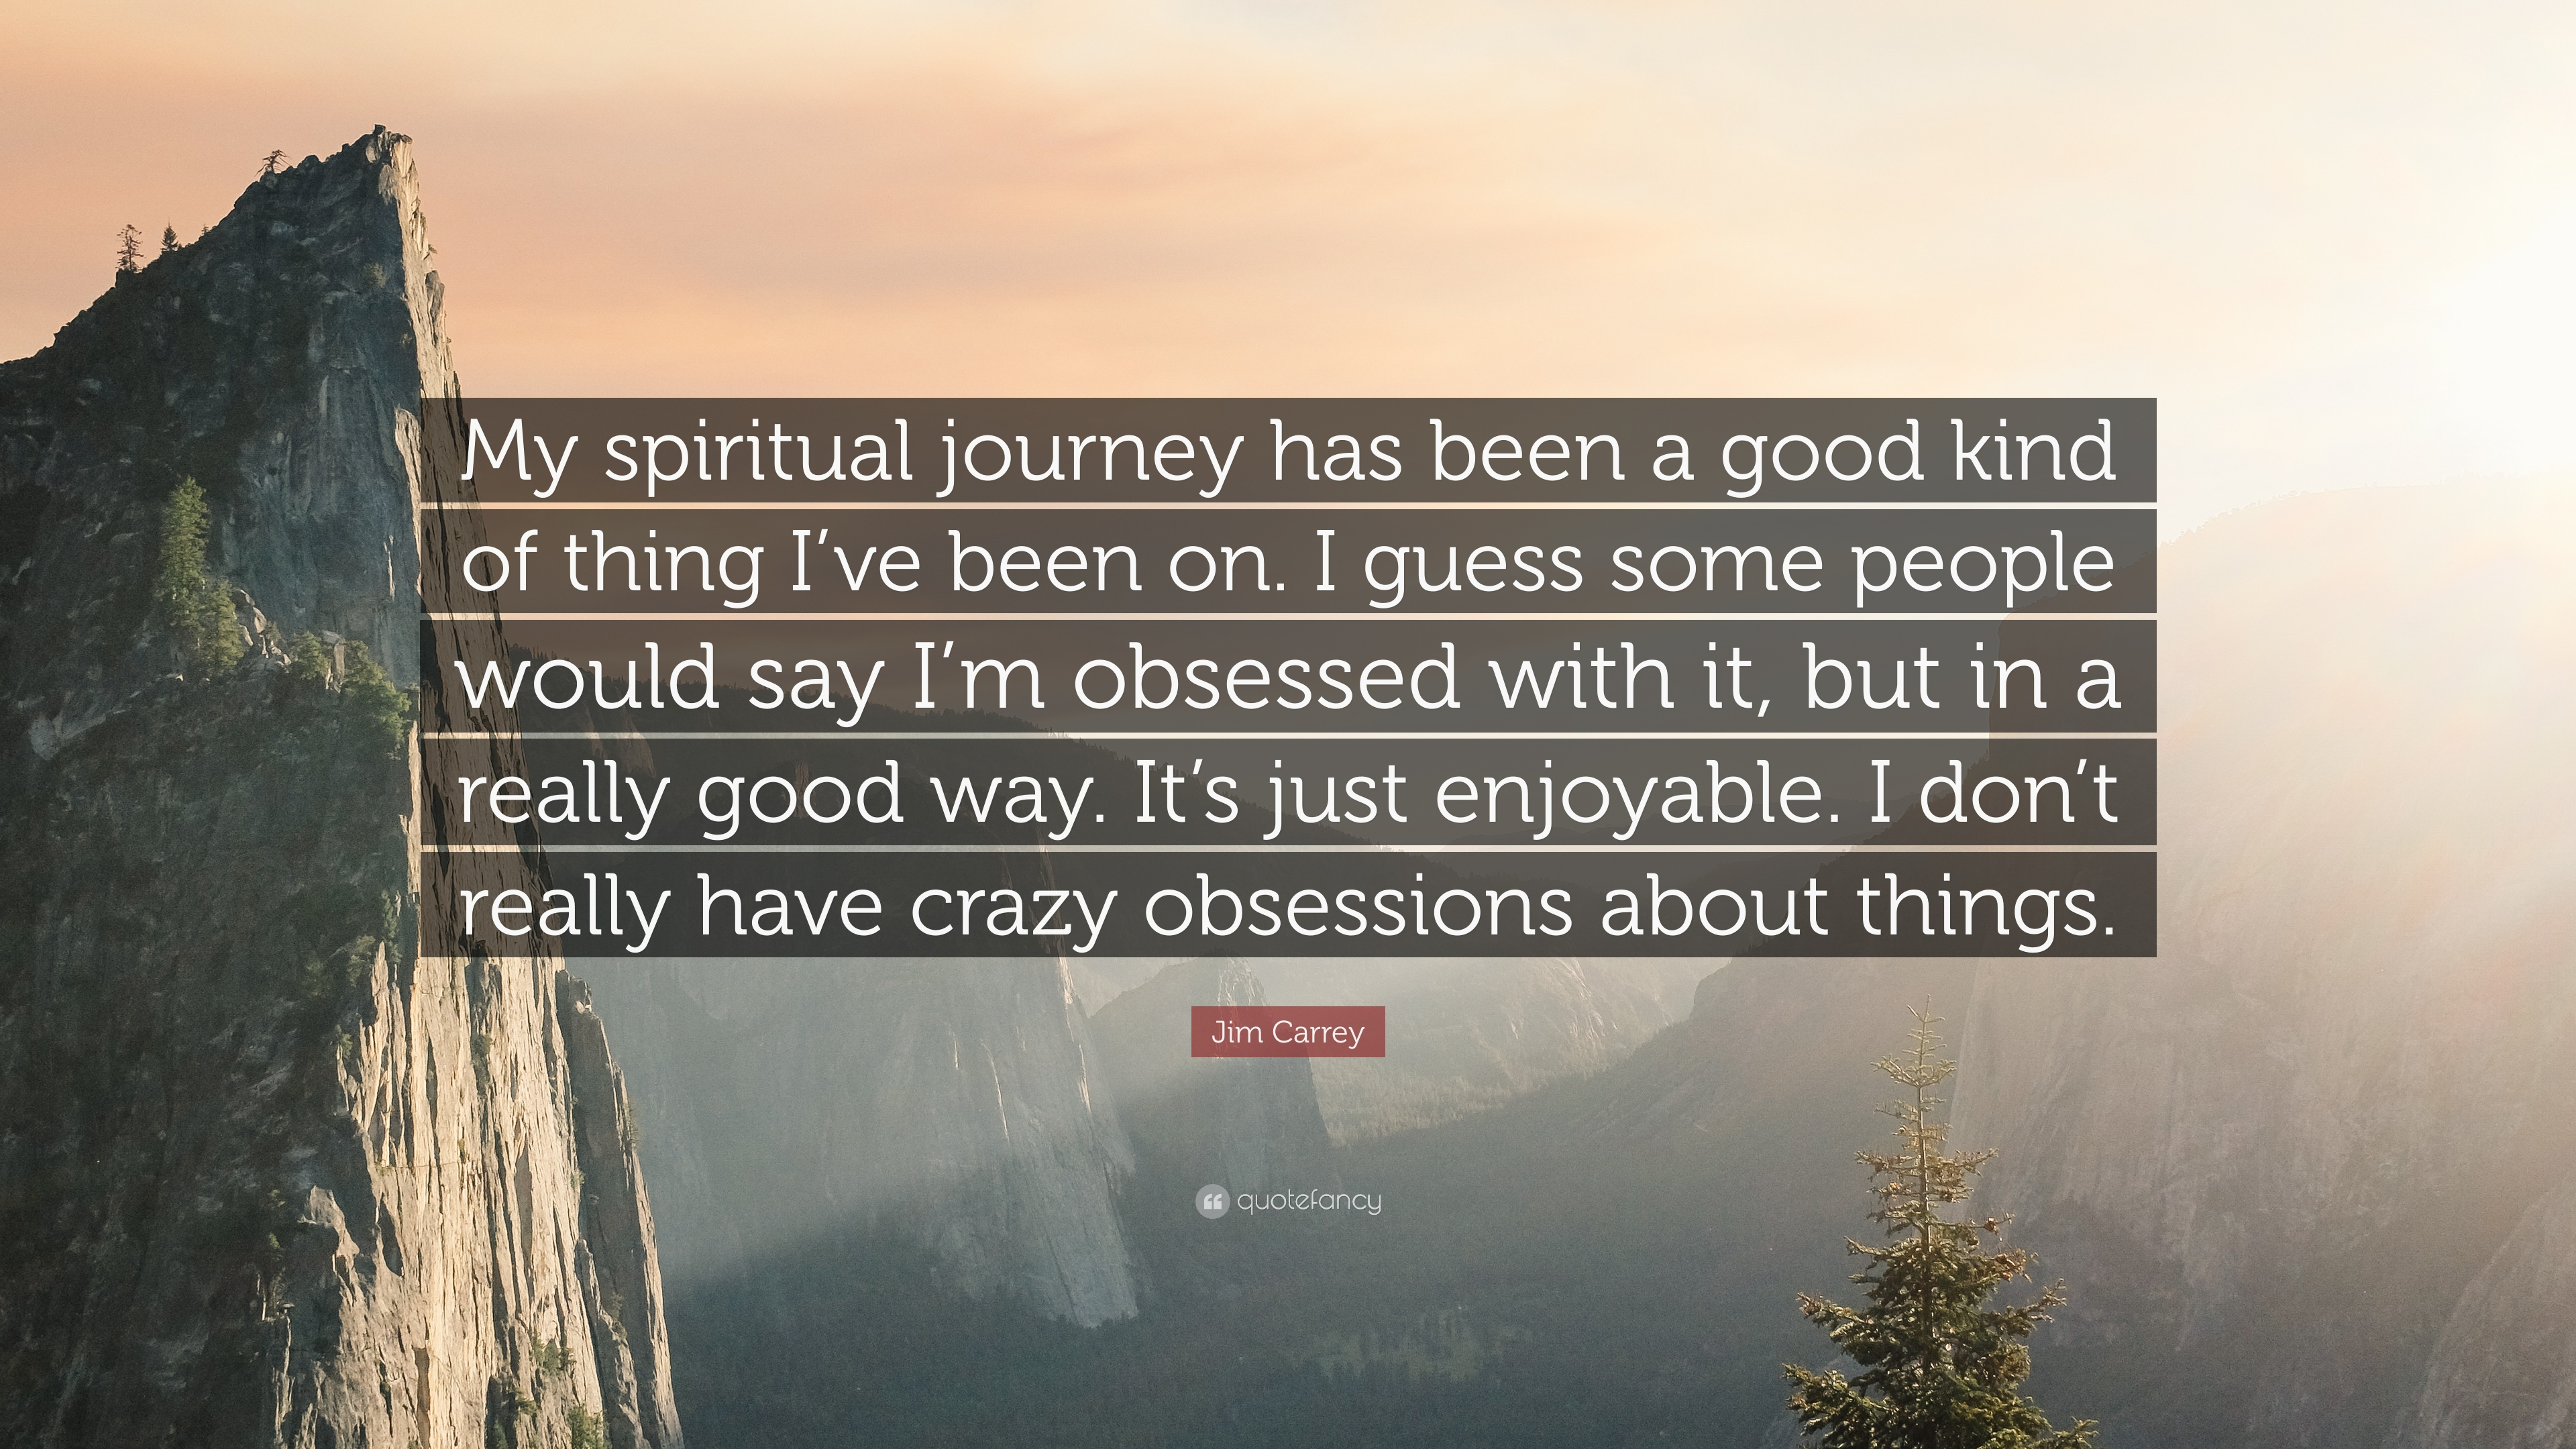 Jim Carrey Quotes (100 wallpapers) - Quotefancy